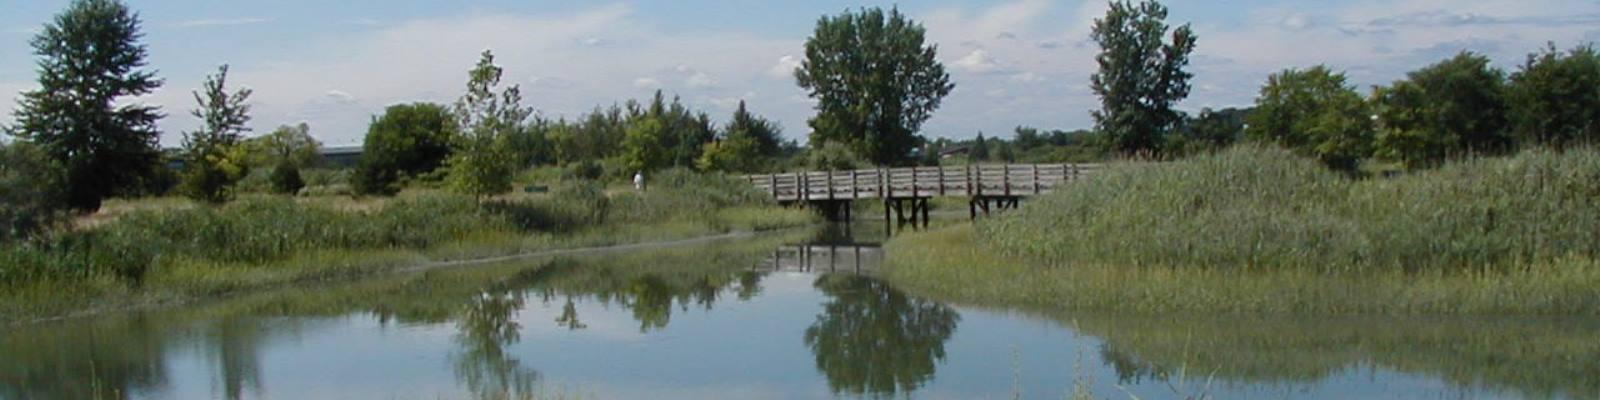 Belle island marsh